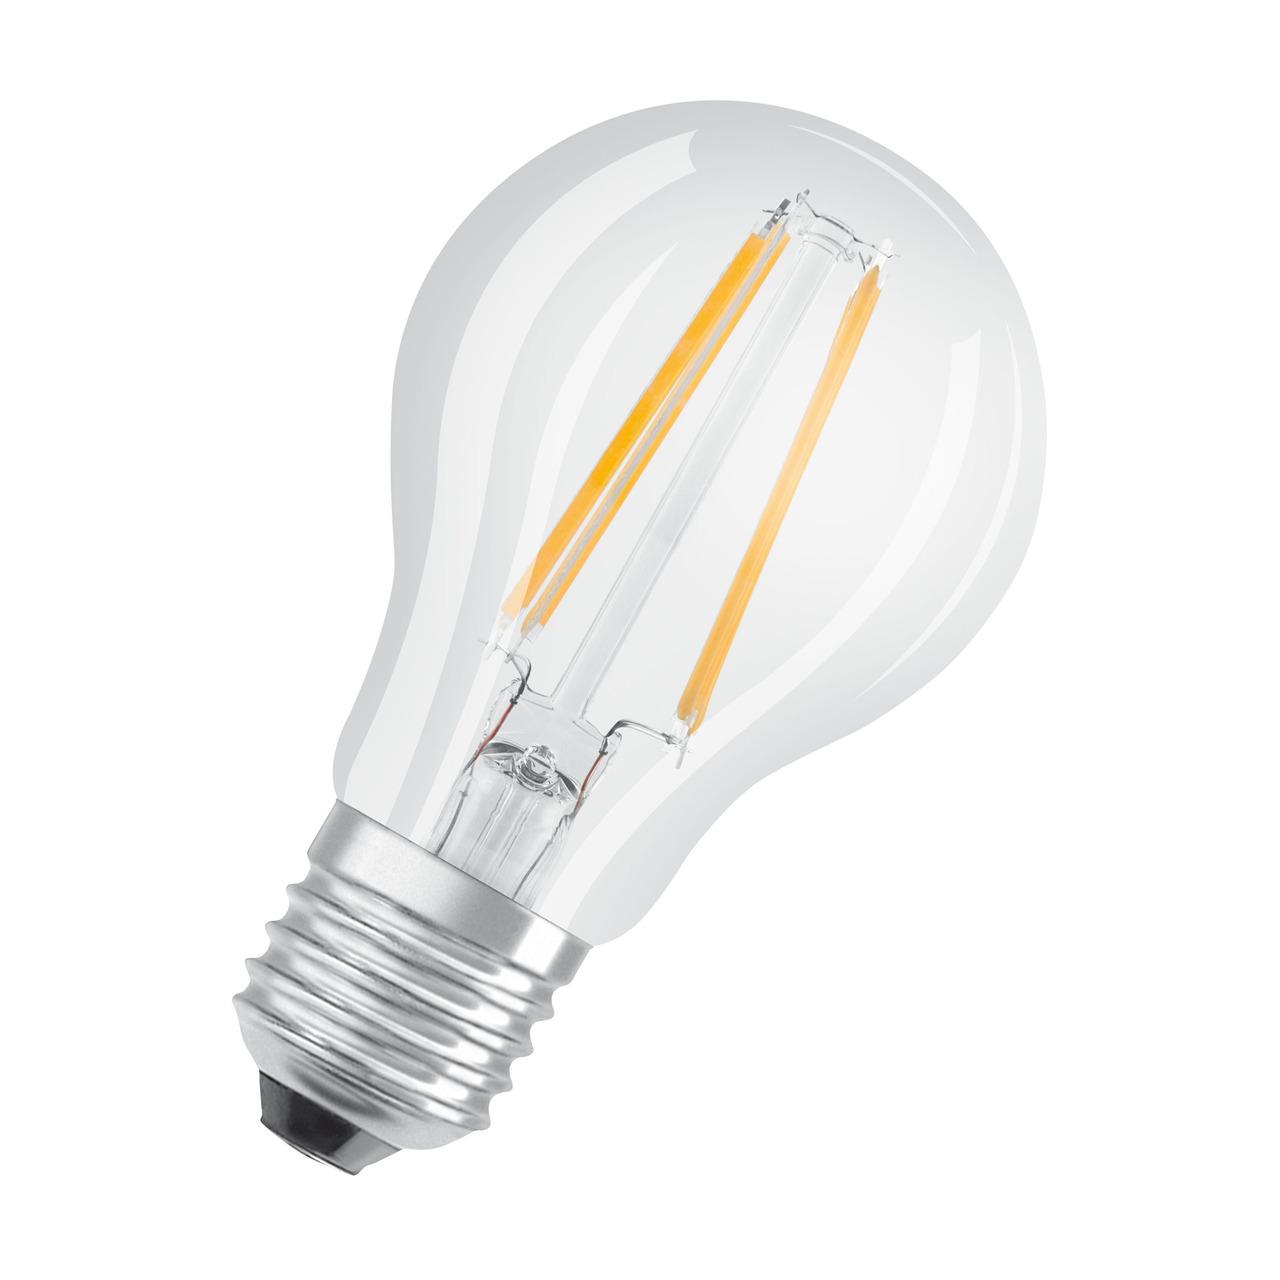 OSRAM 7-W-LED-Lampe A60- E27- 806 lm- warmweiss - neutralweiss- klar